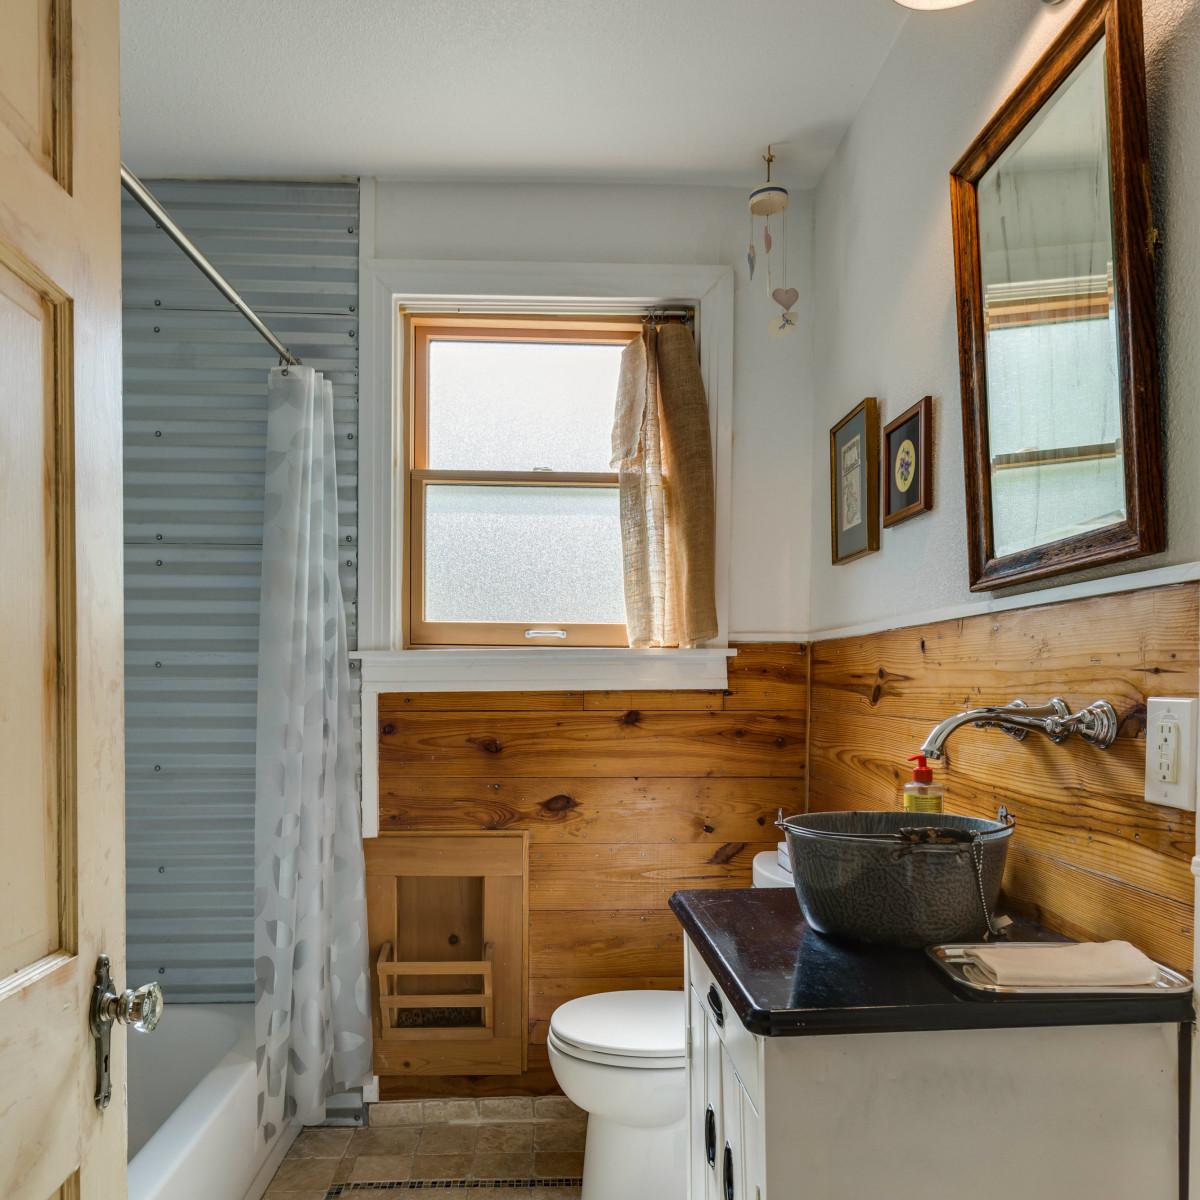 115 W Castano San Antonio house for sale bathroom